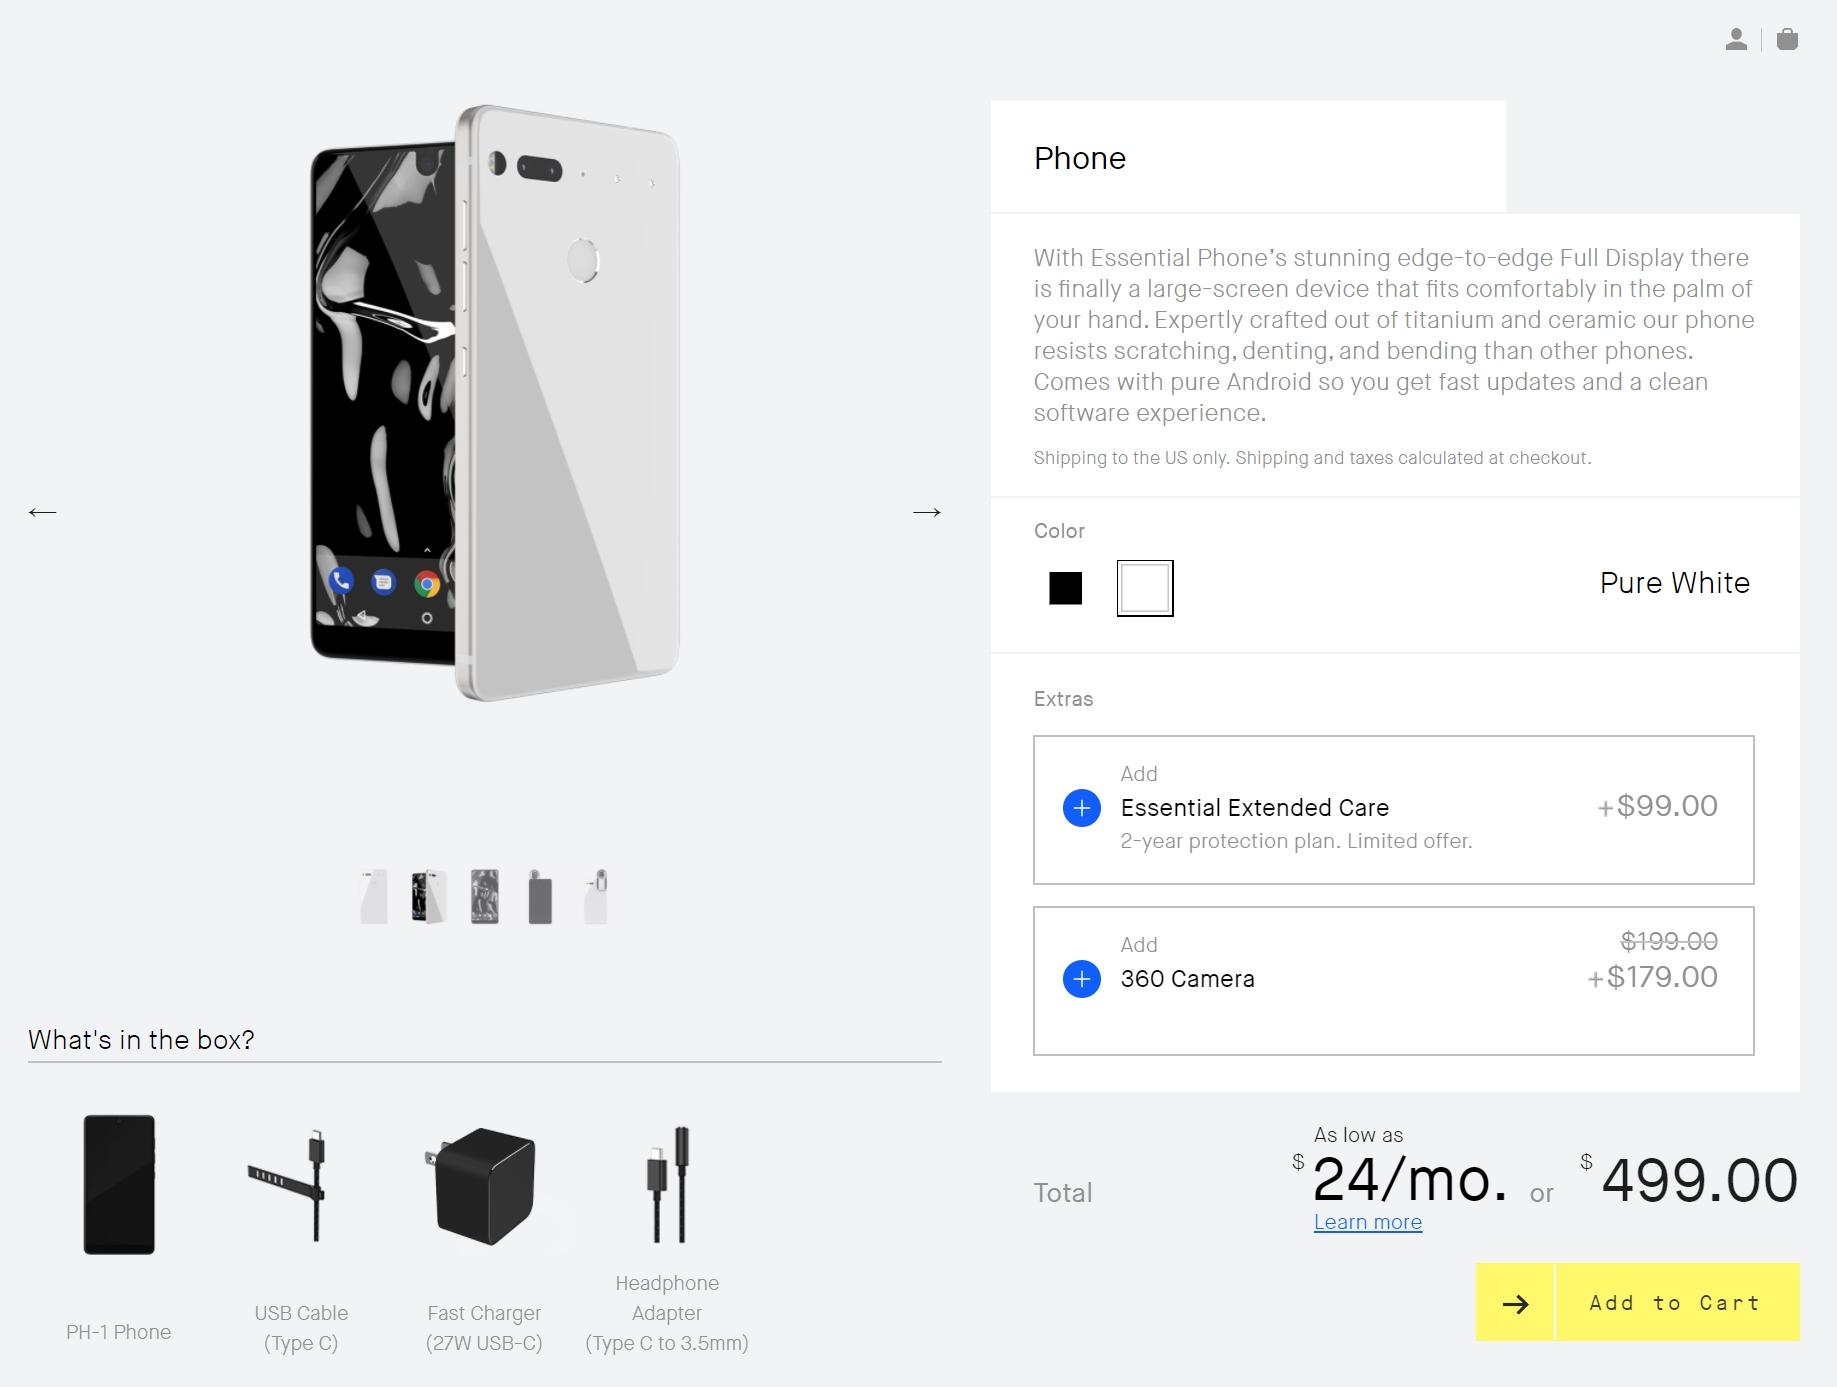 l 39 essential phone baisse drastiquement son prix pour concurrencer oneplus frandroid. Black Bedroom Furniture Sets. Home Design Ideas